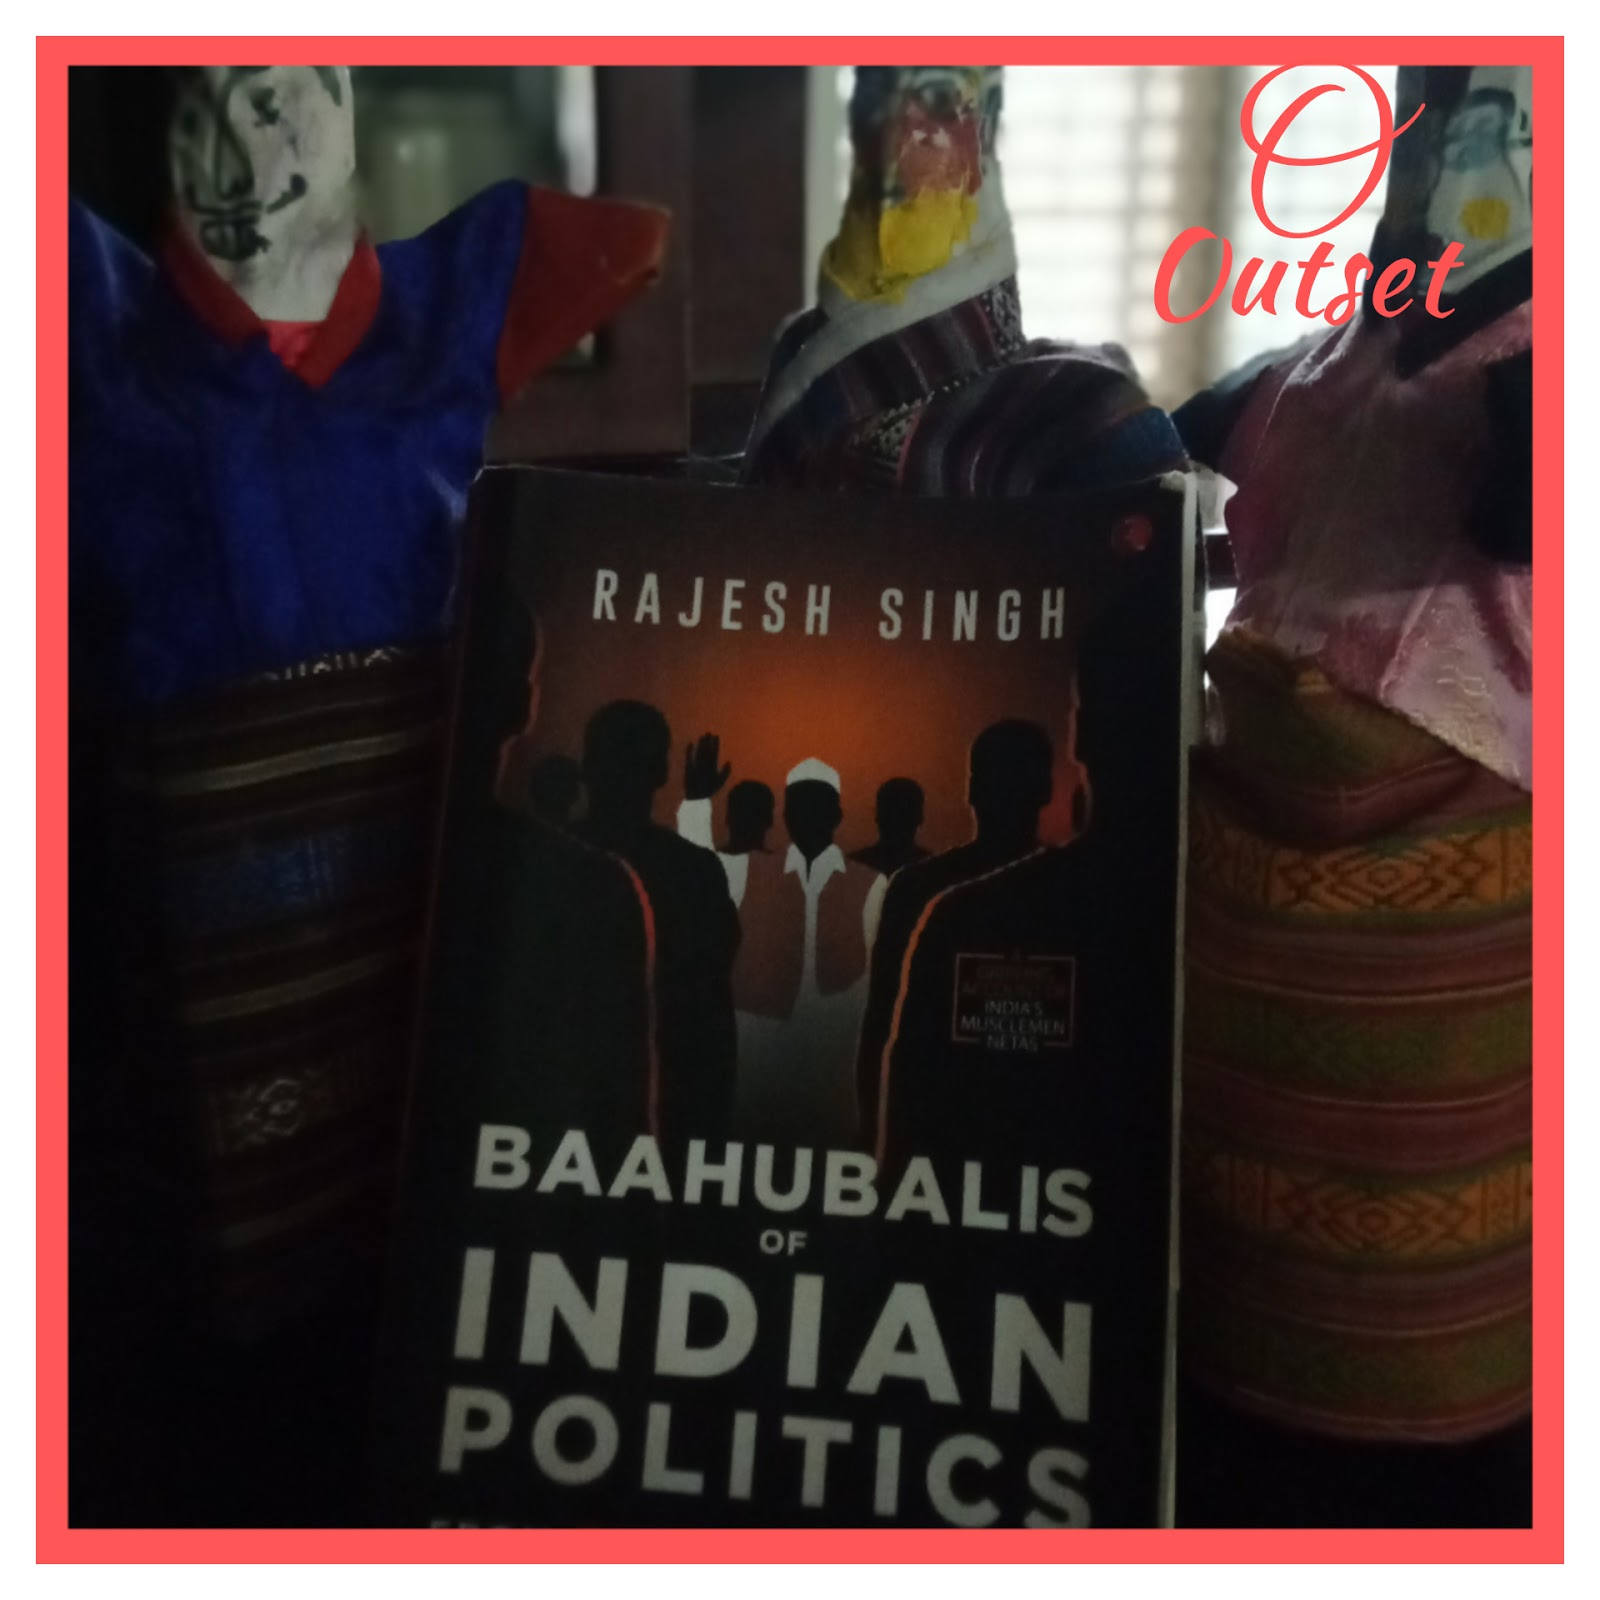 Bahubalis of Indian Politics